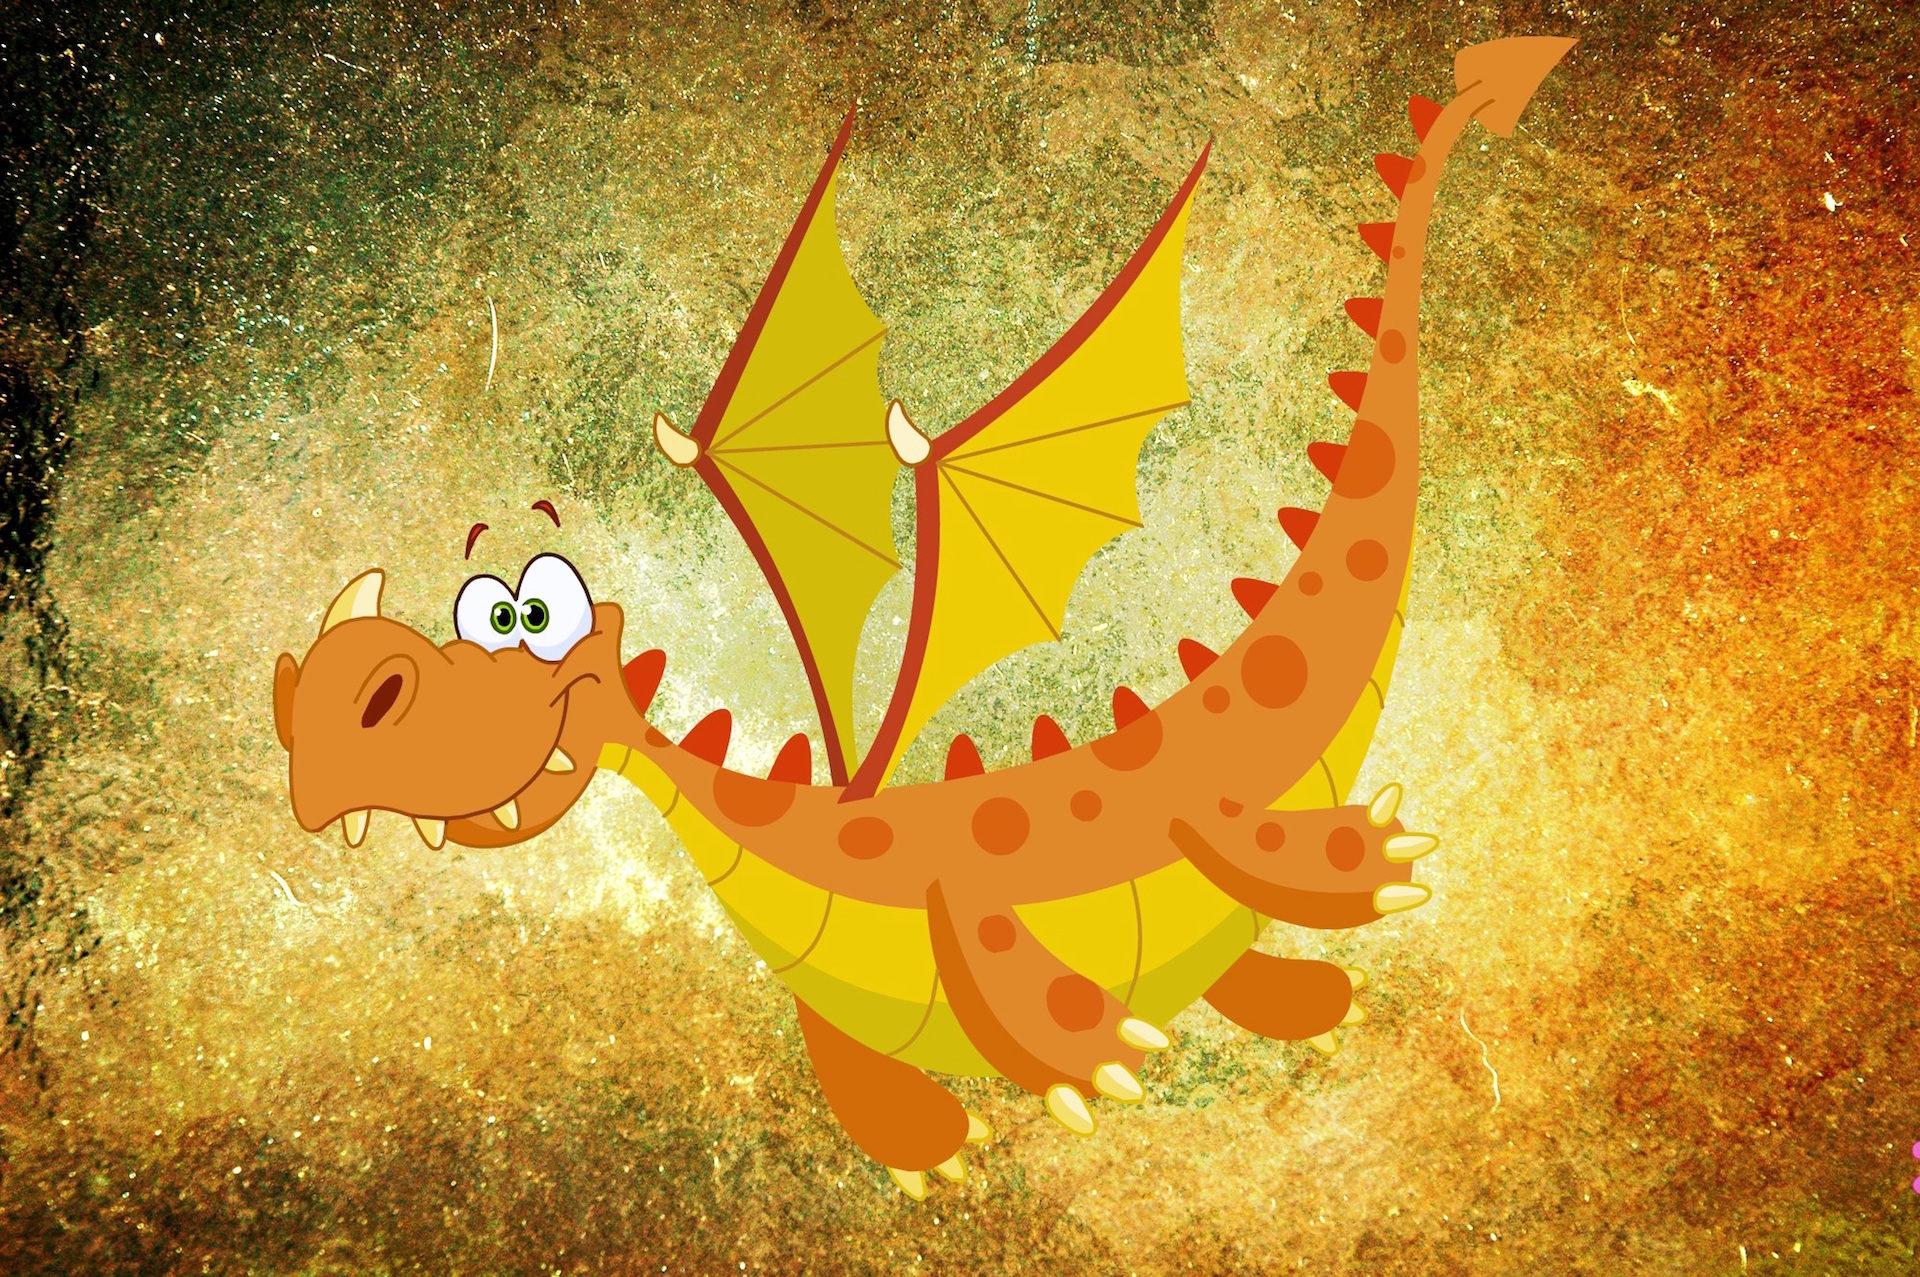 ड्रैगन, comic, ड्राइंग, राक्षस, पंख - HD वॉलपेपर - प्रोफेसर-falken.com